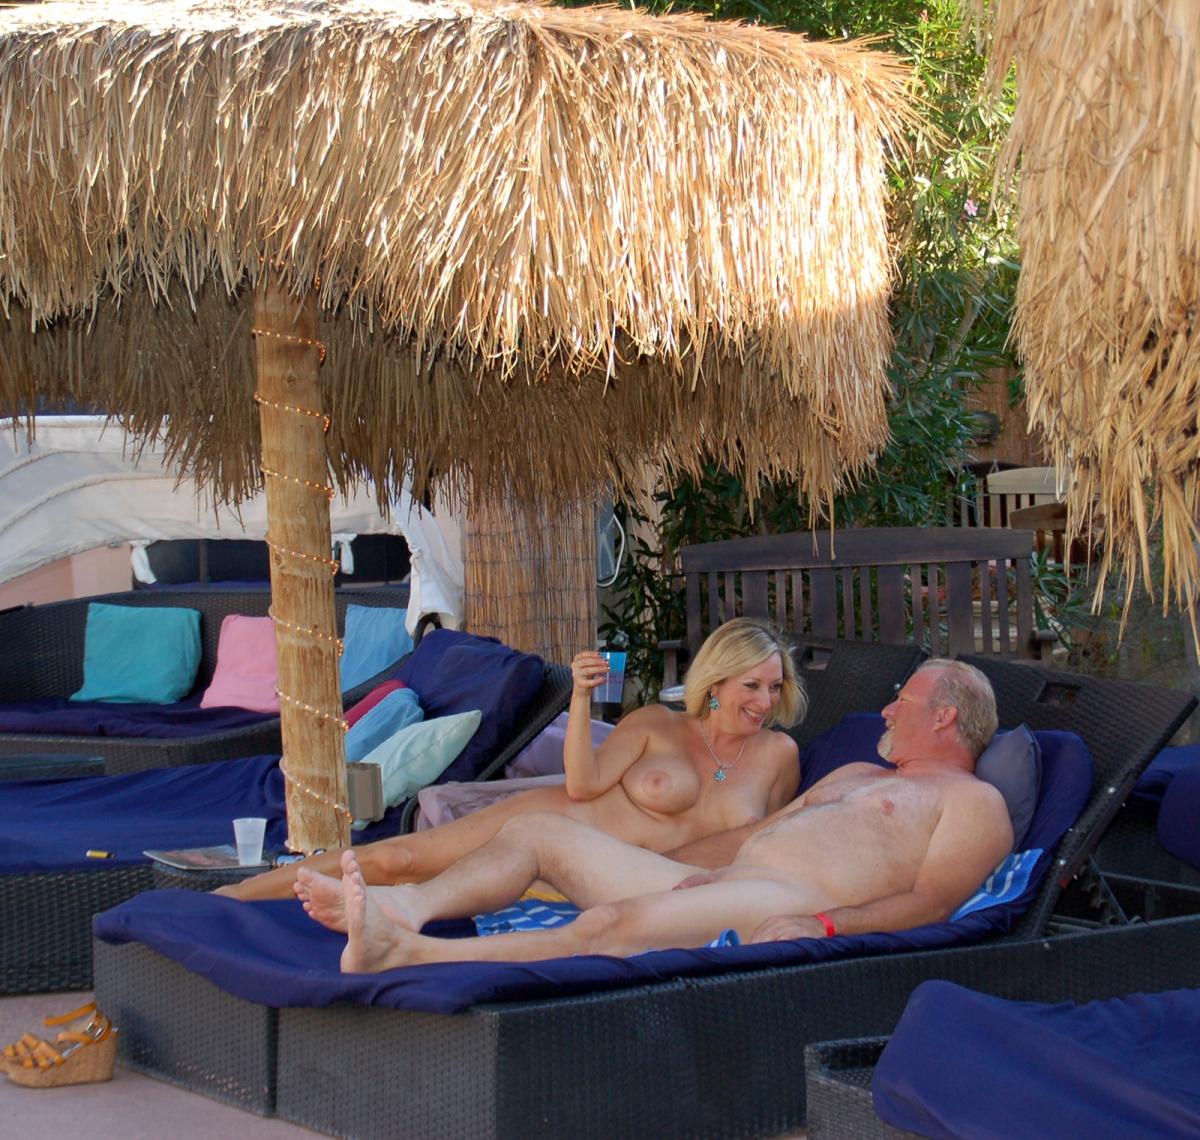 Nudist clubs california